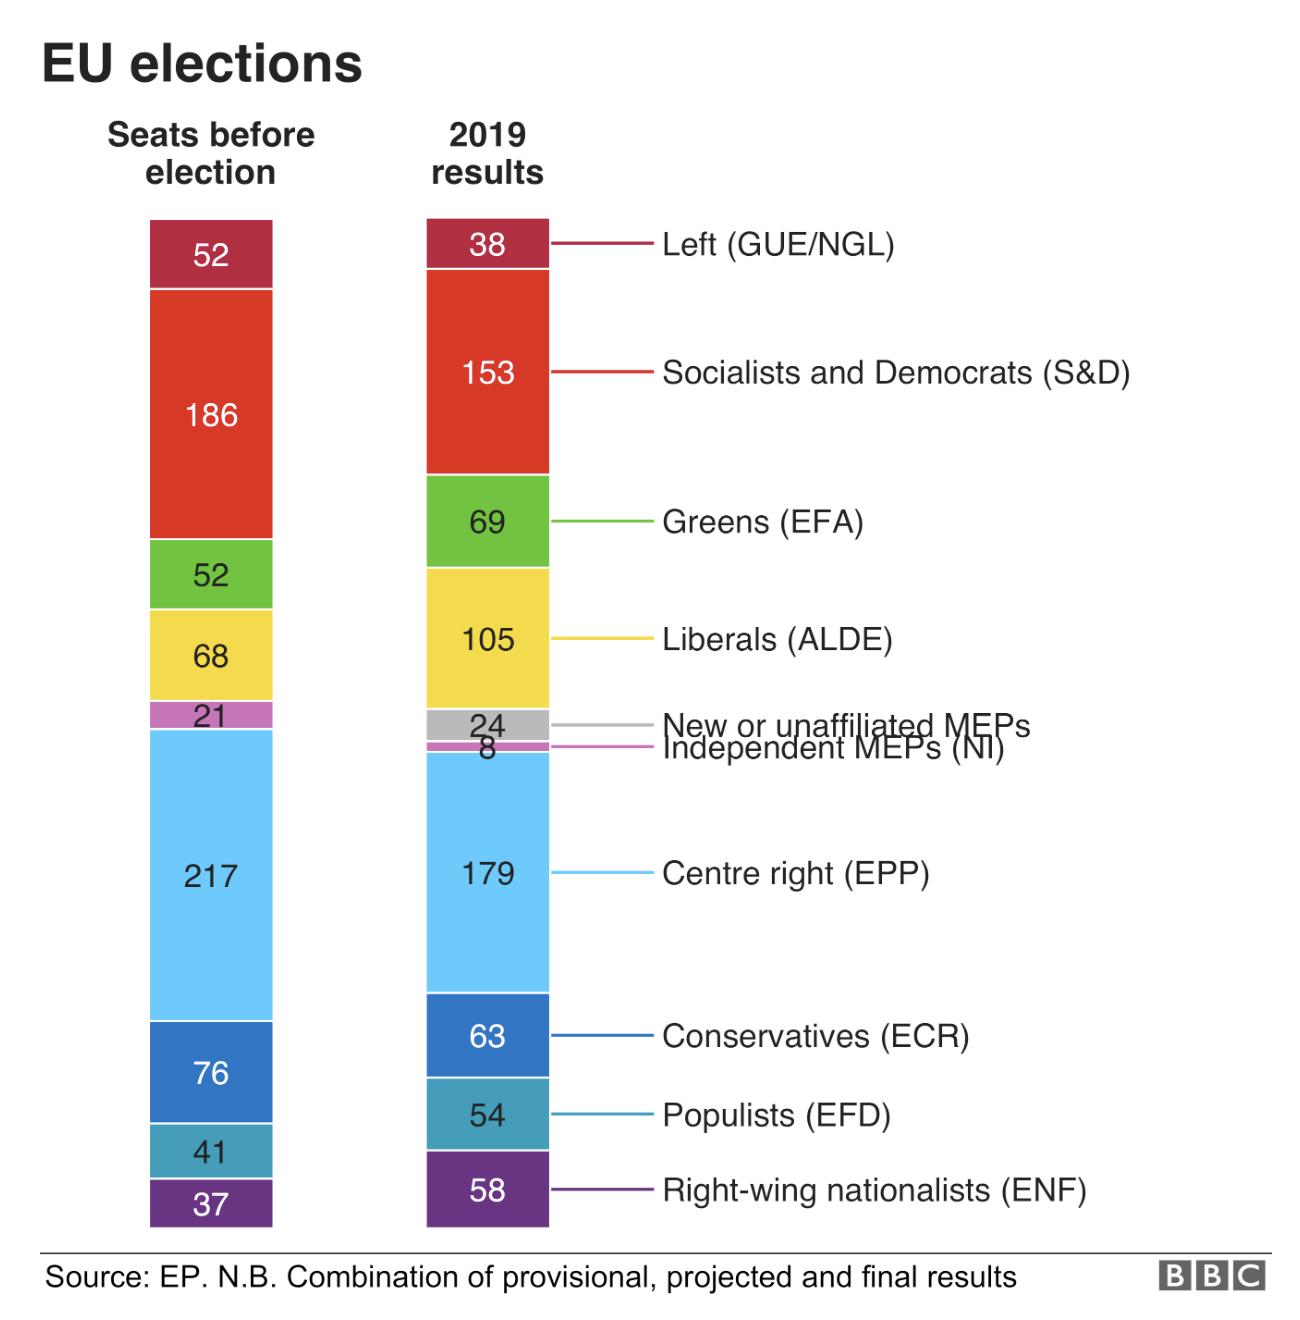 Source: BBC, 2019b